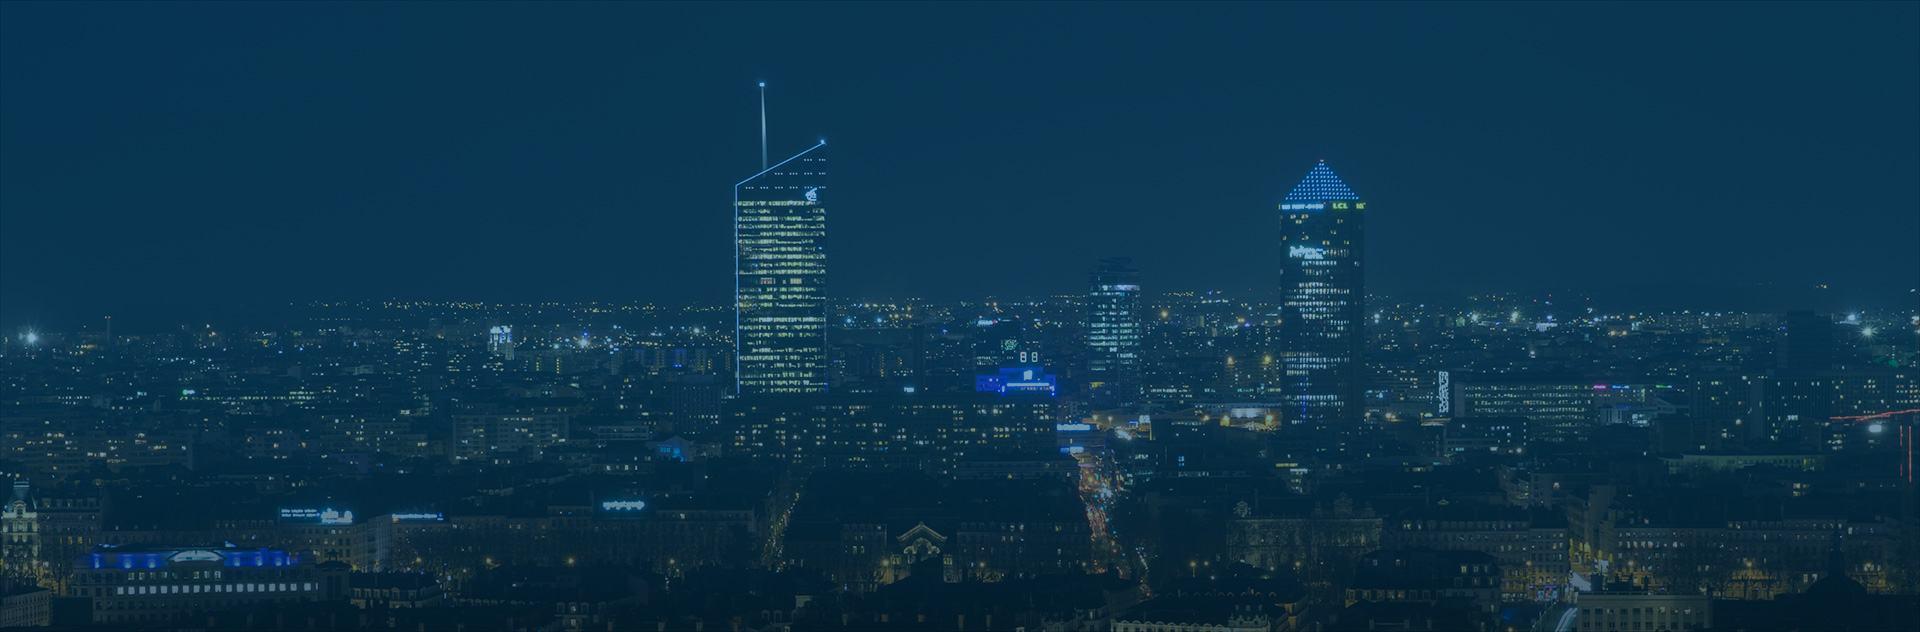 panorama de lyon la nuit